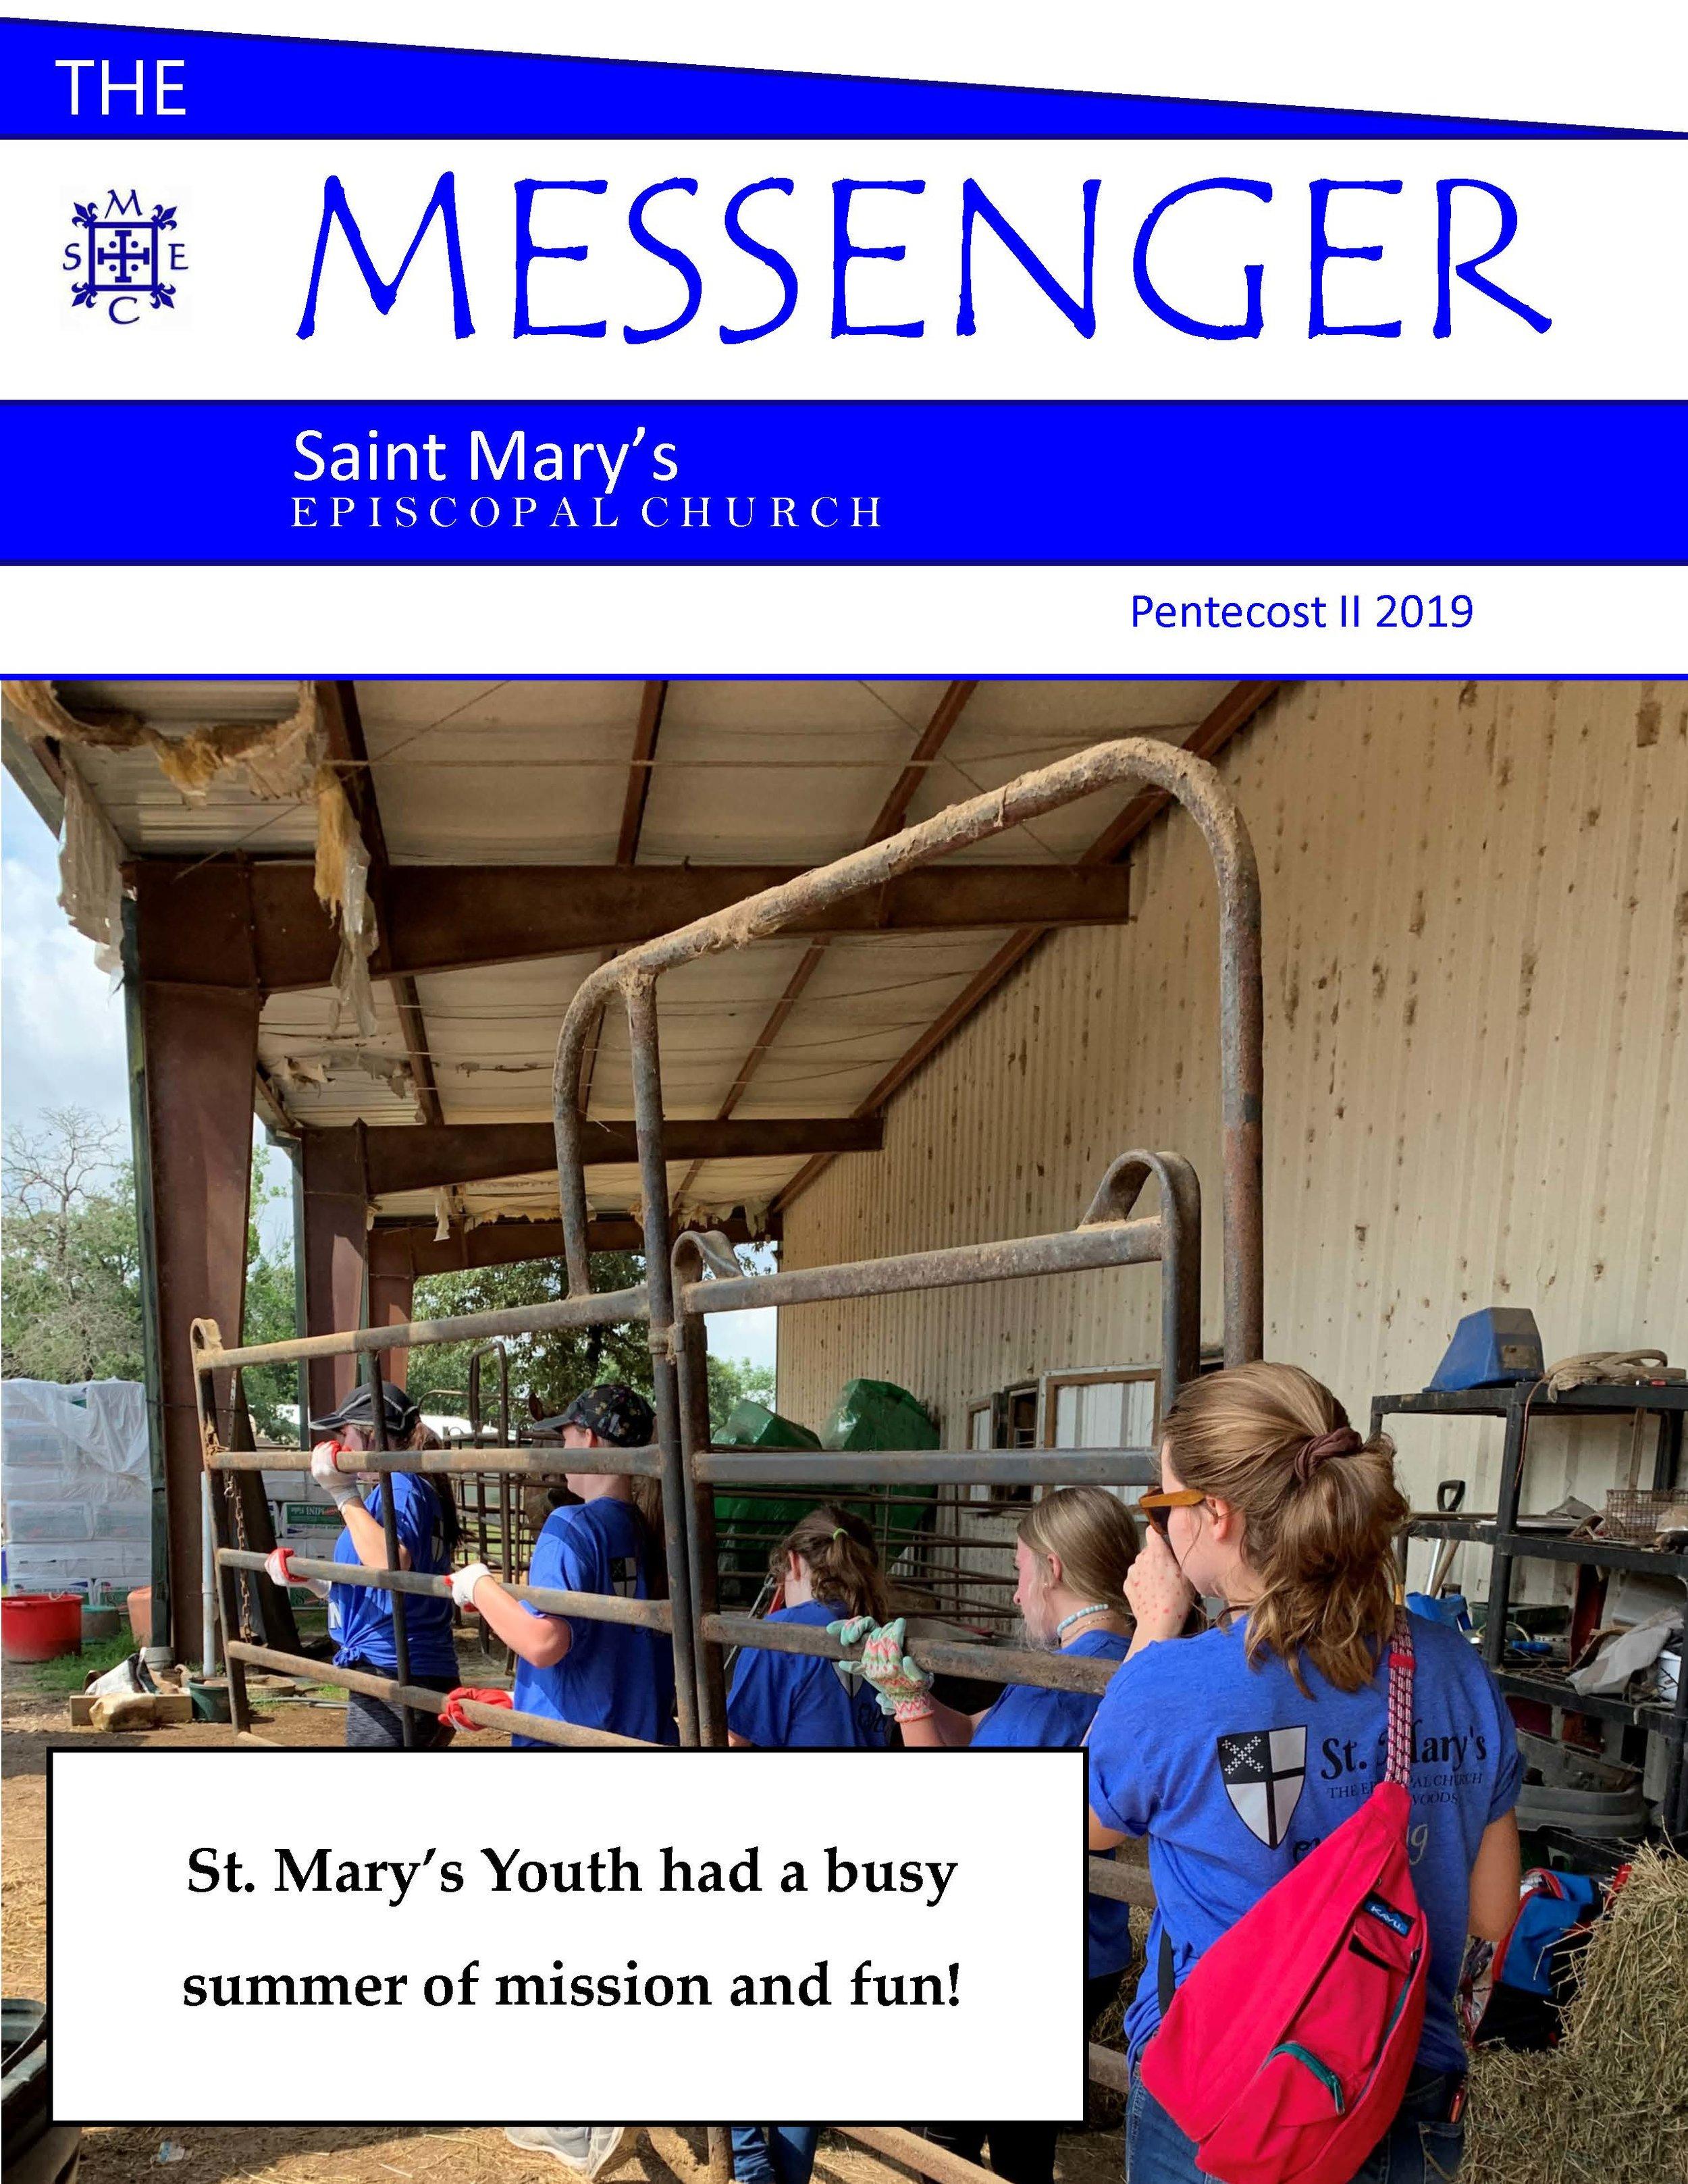 Messenger Pentecost II 2019 Cover.jpg